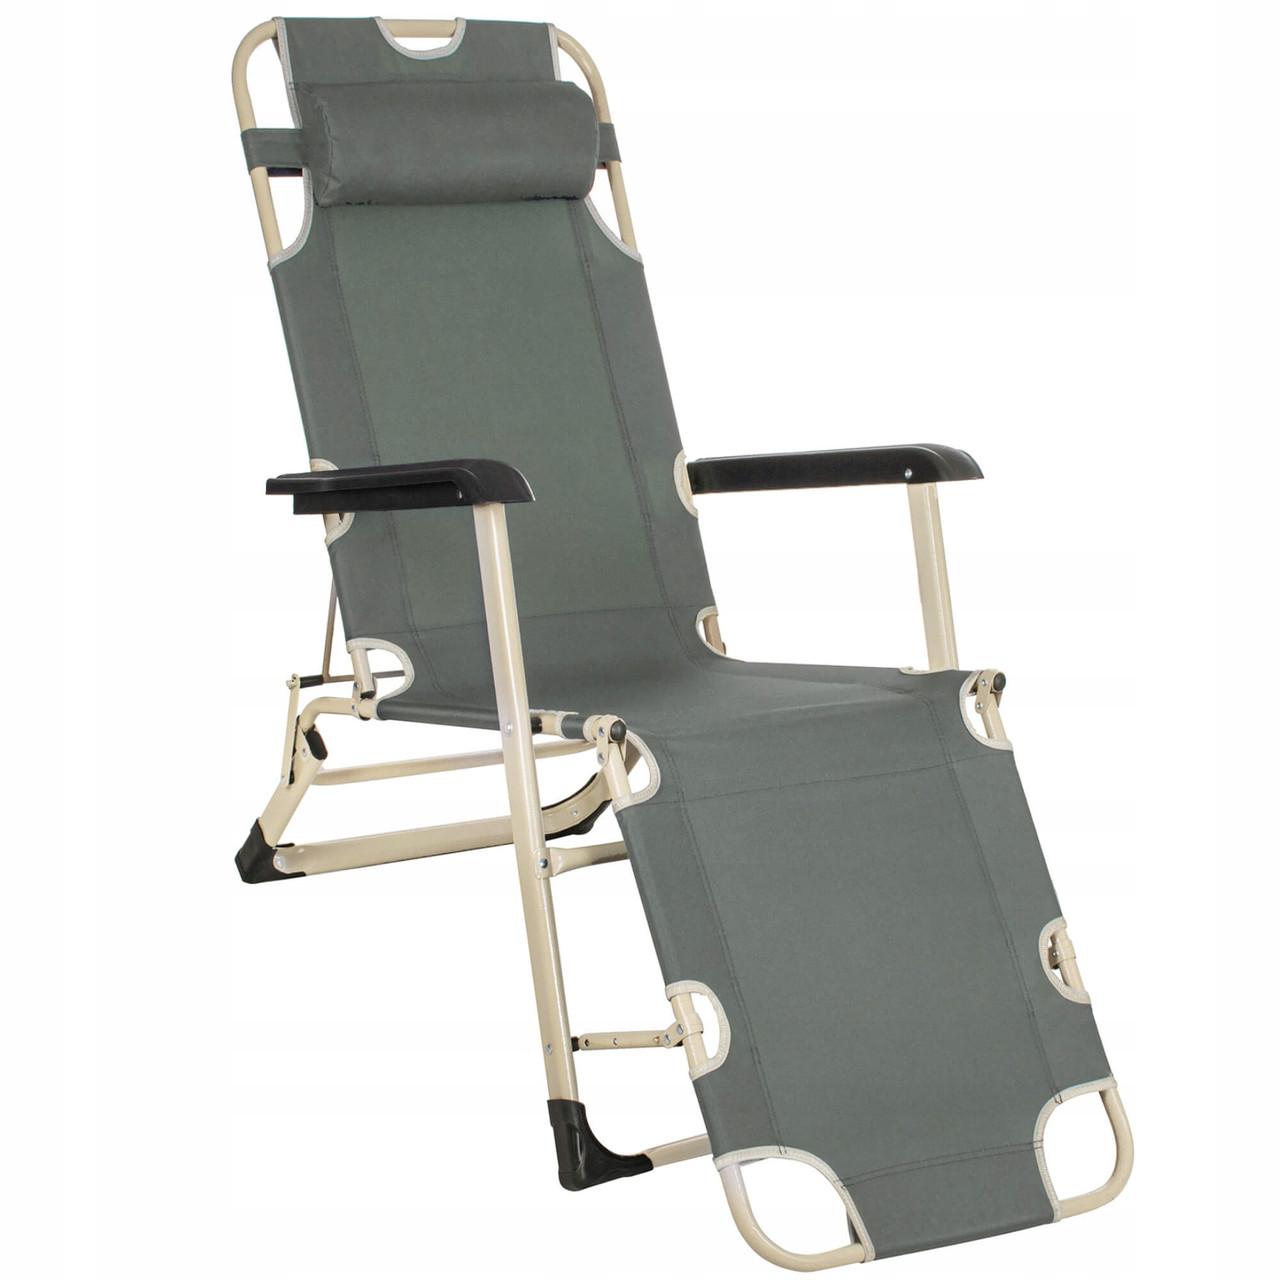 Шезлонг (крісло-лежак) для пляжу, тераси і саду Springos Zero Gravity GC0036